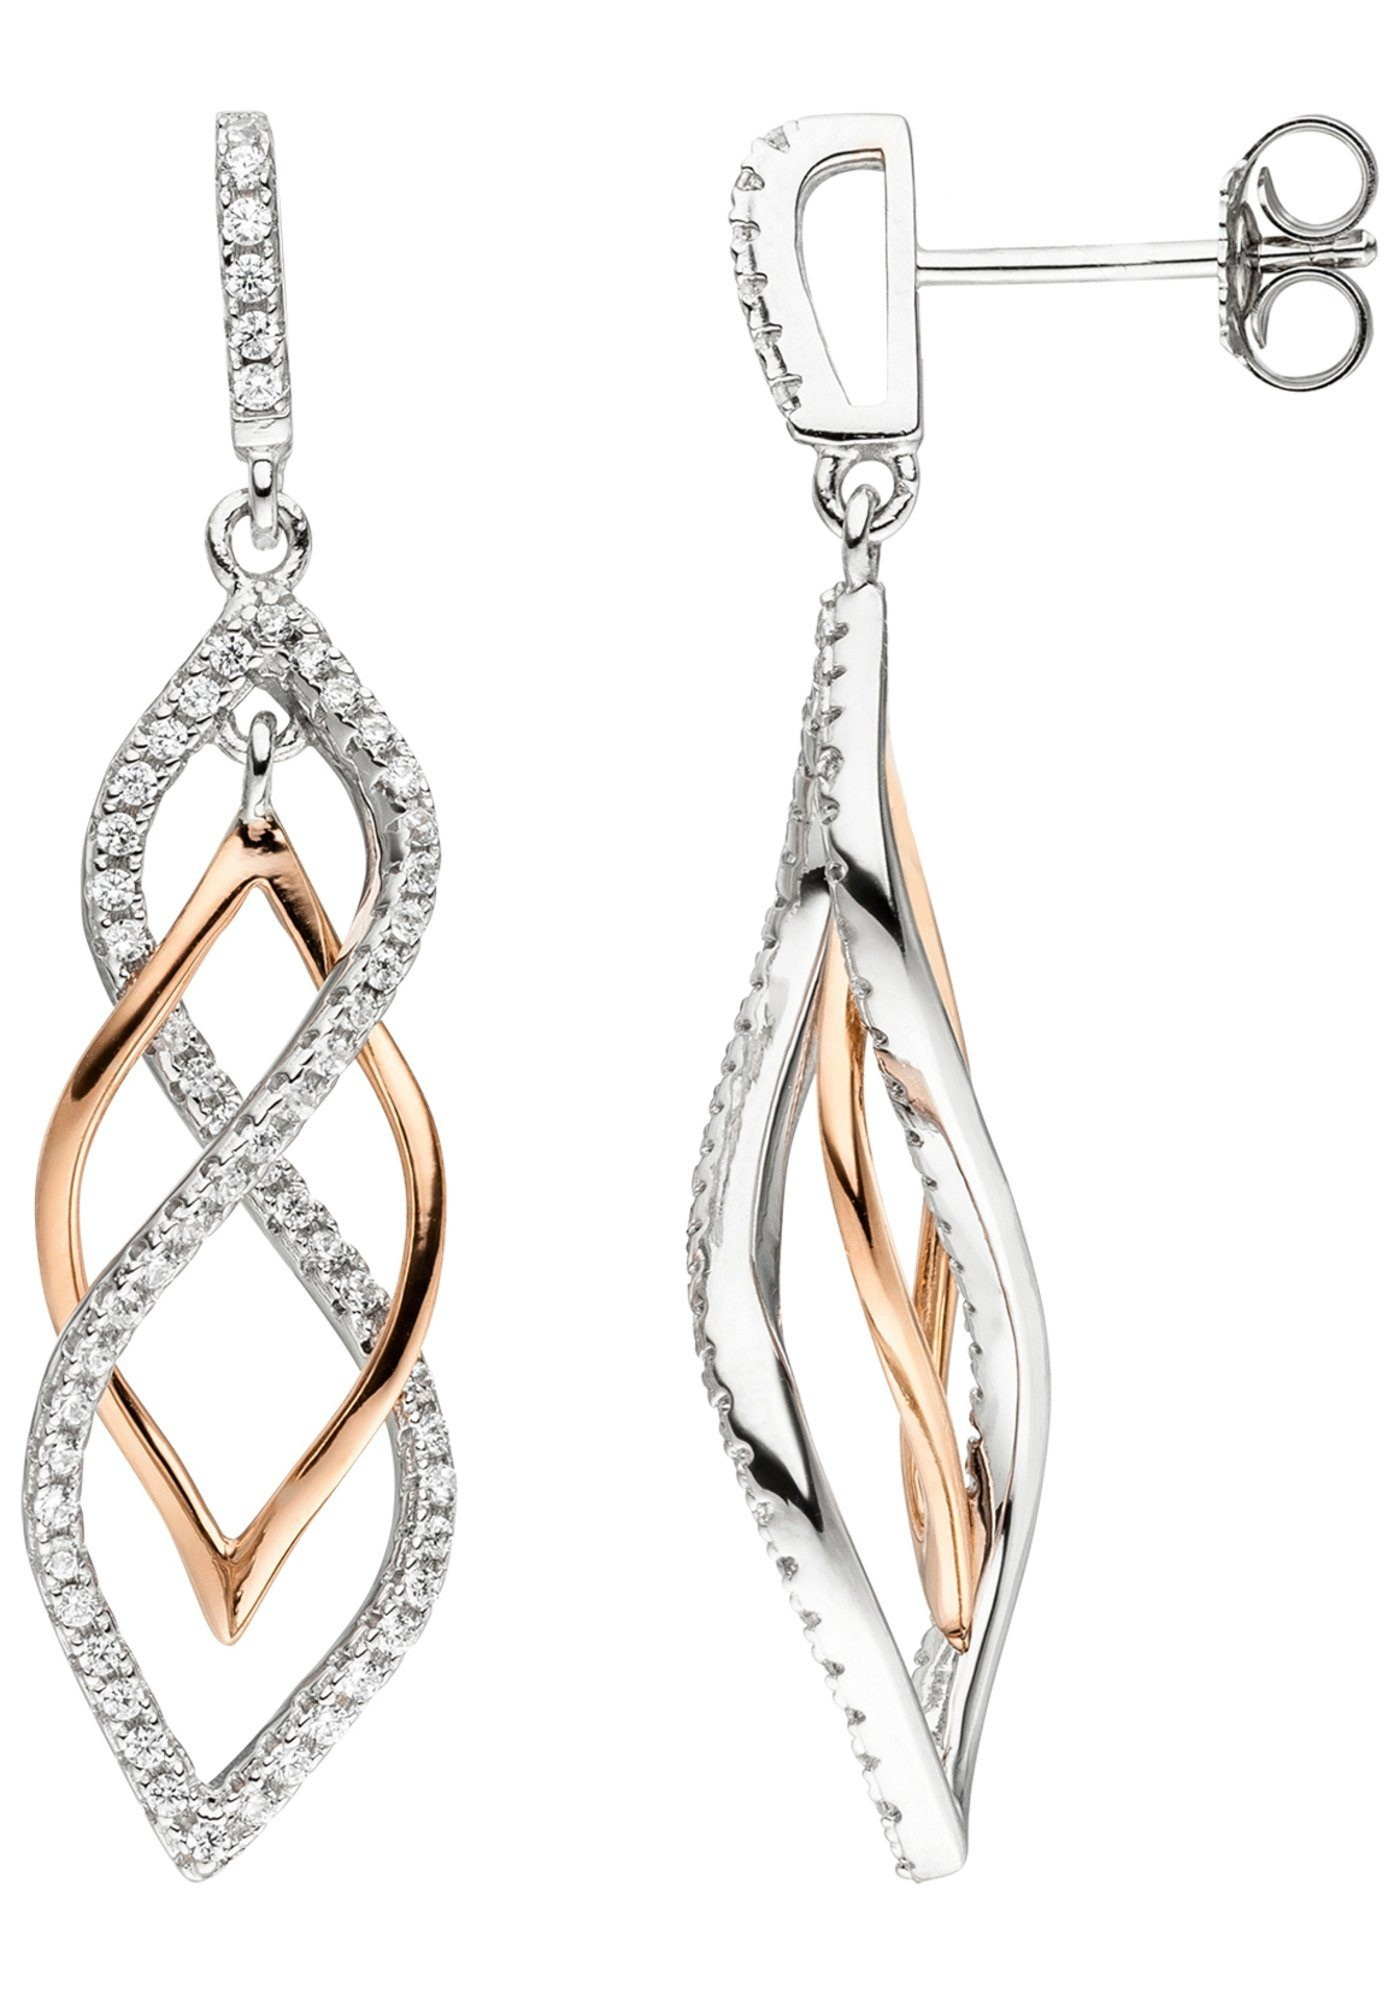 JOBO Paar Ohrhänger 925 Silber bicolor vergoldet mit Zirkonia